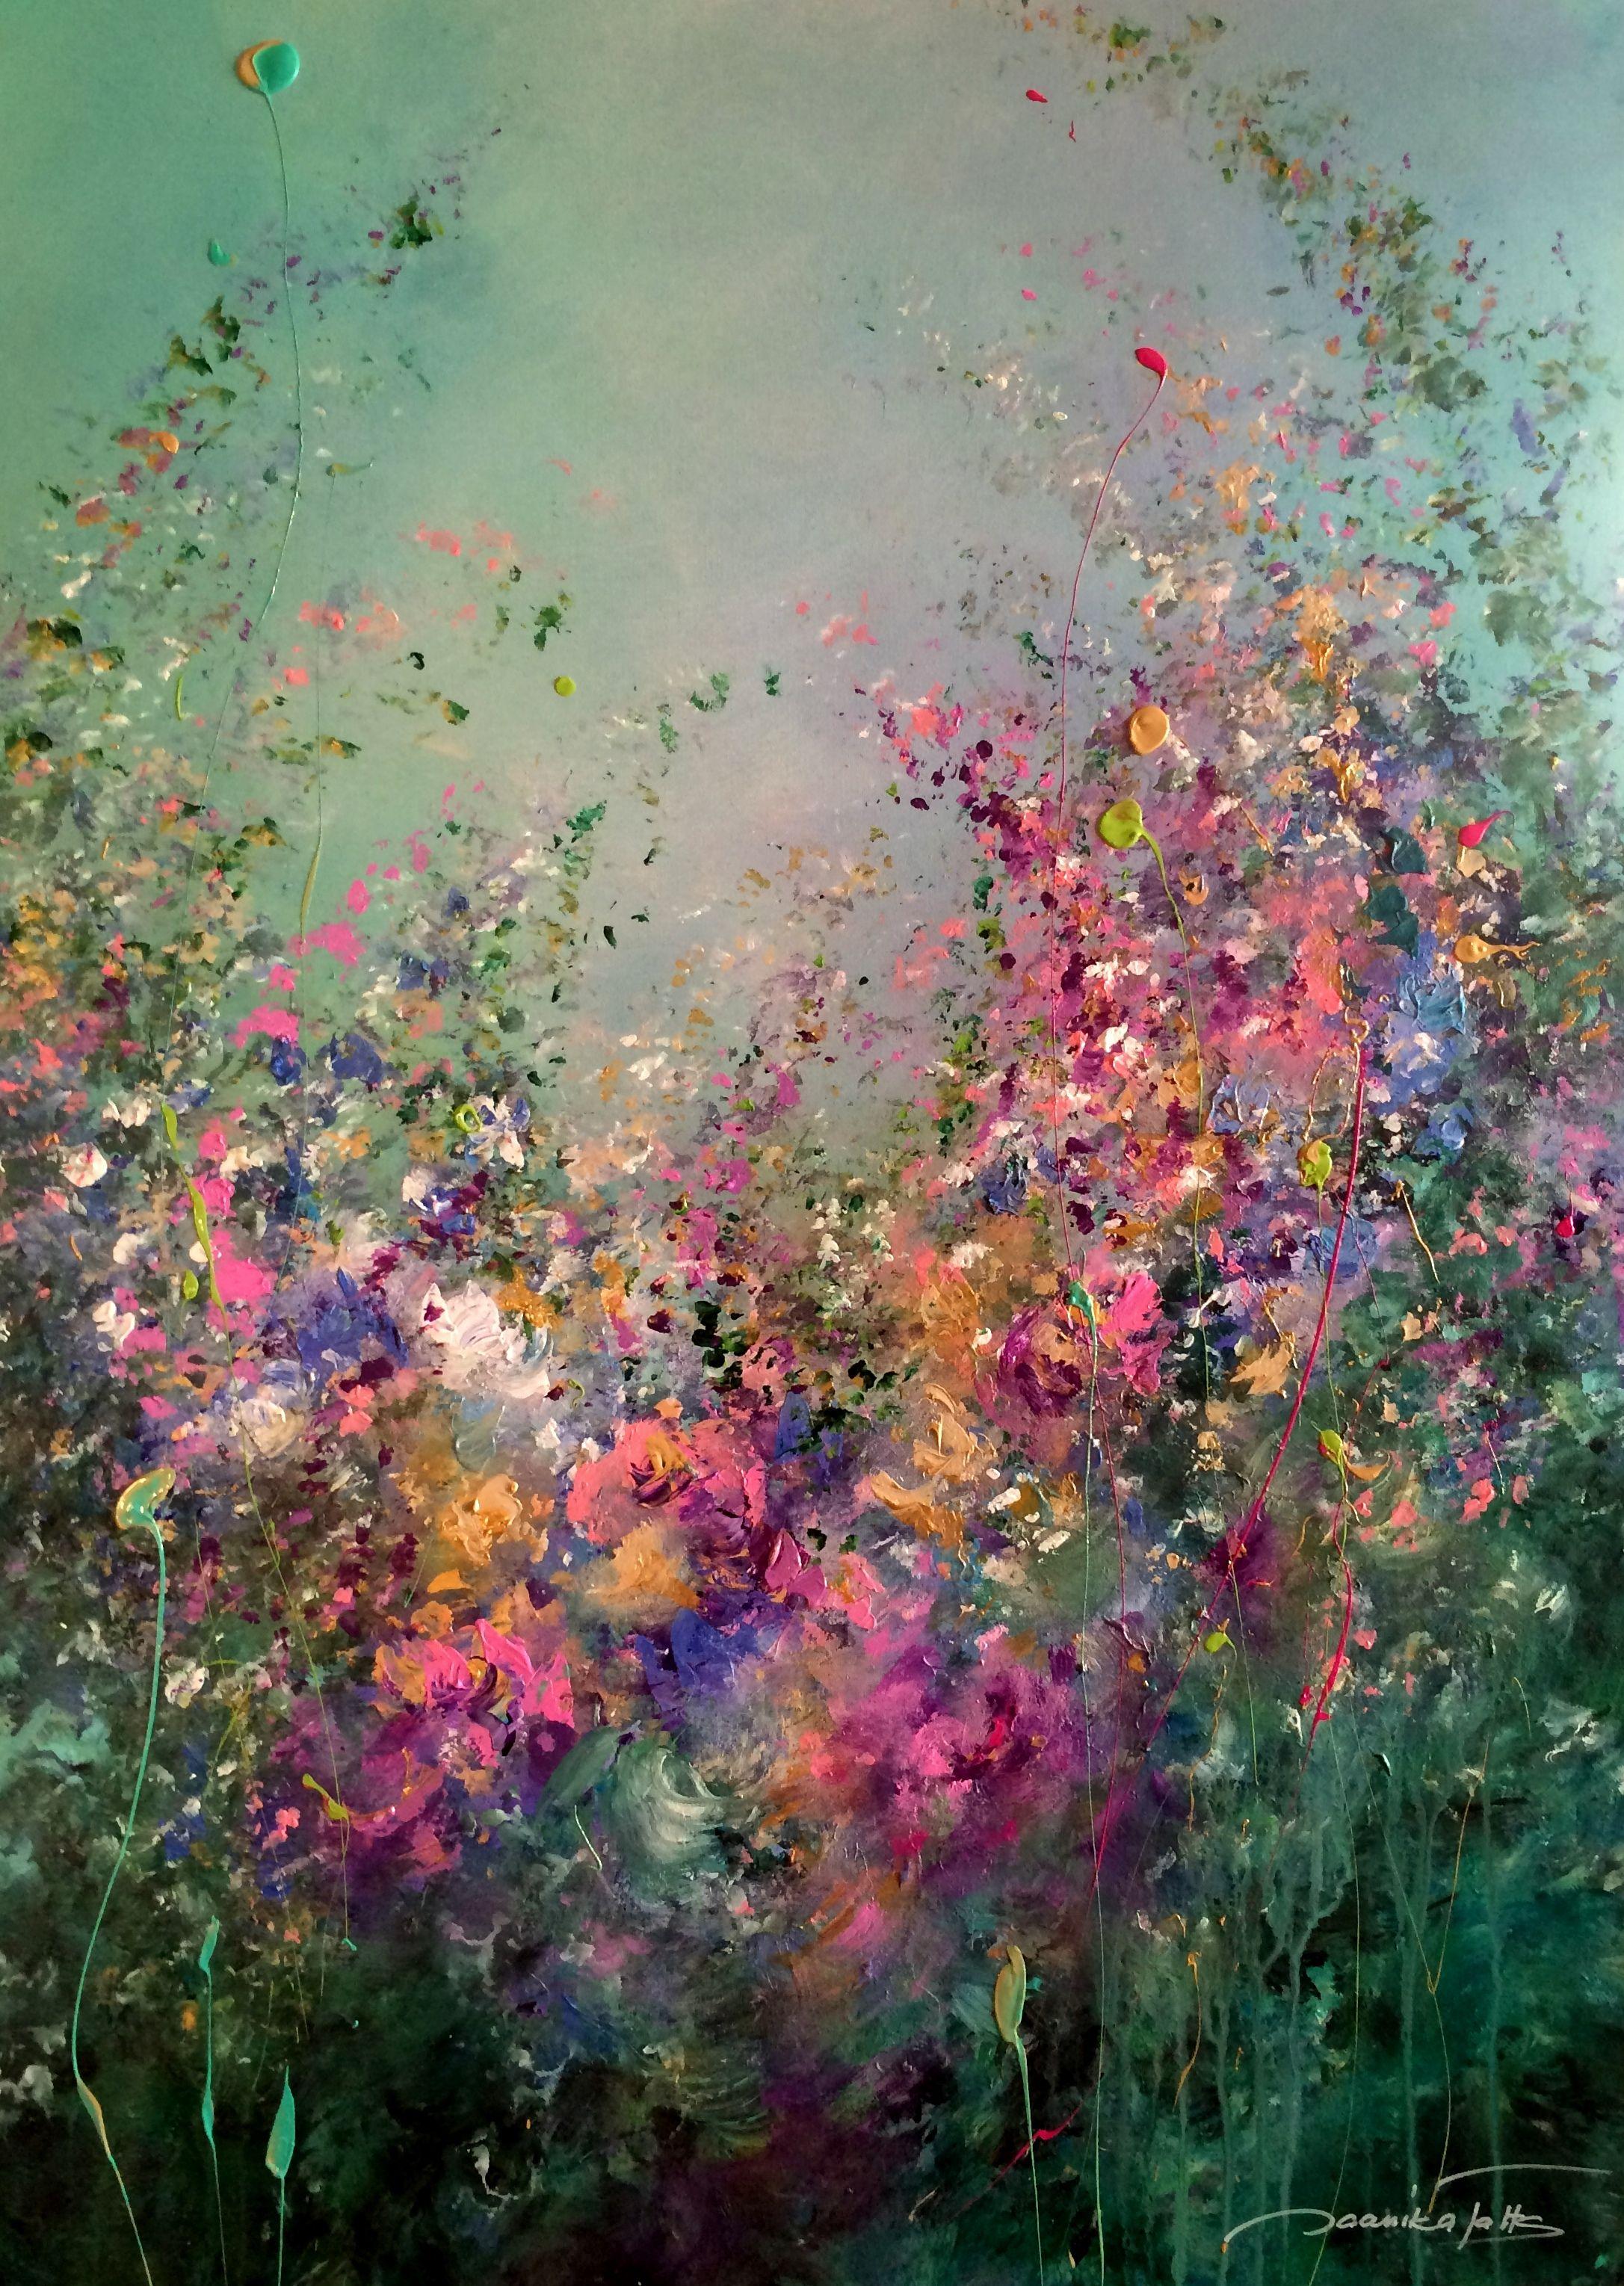 Bloom & Blossom